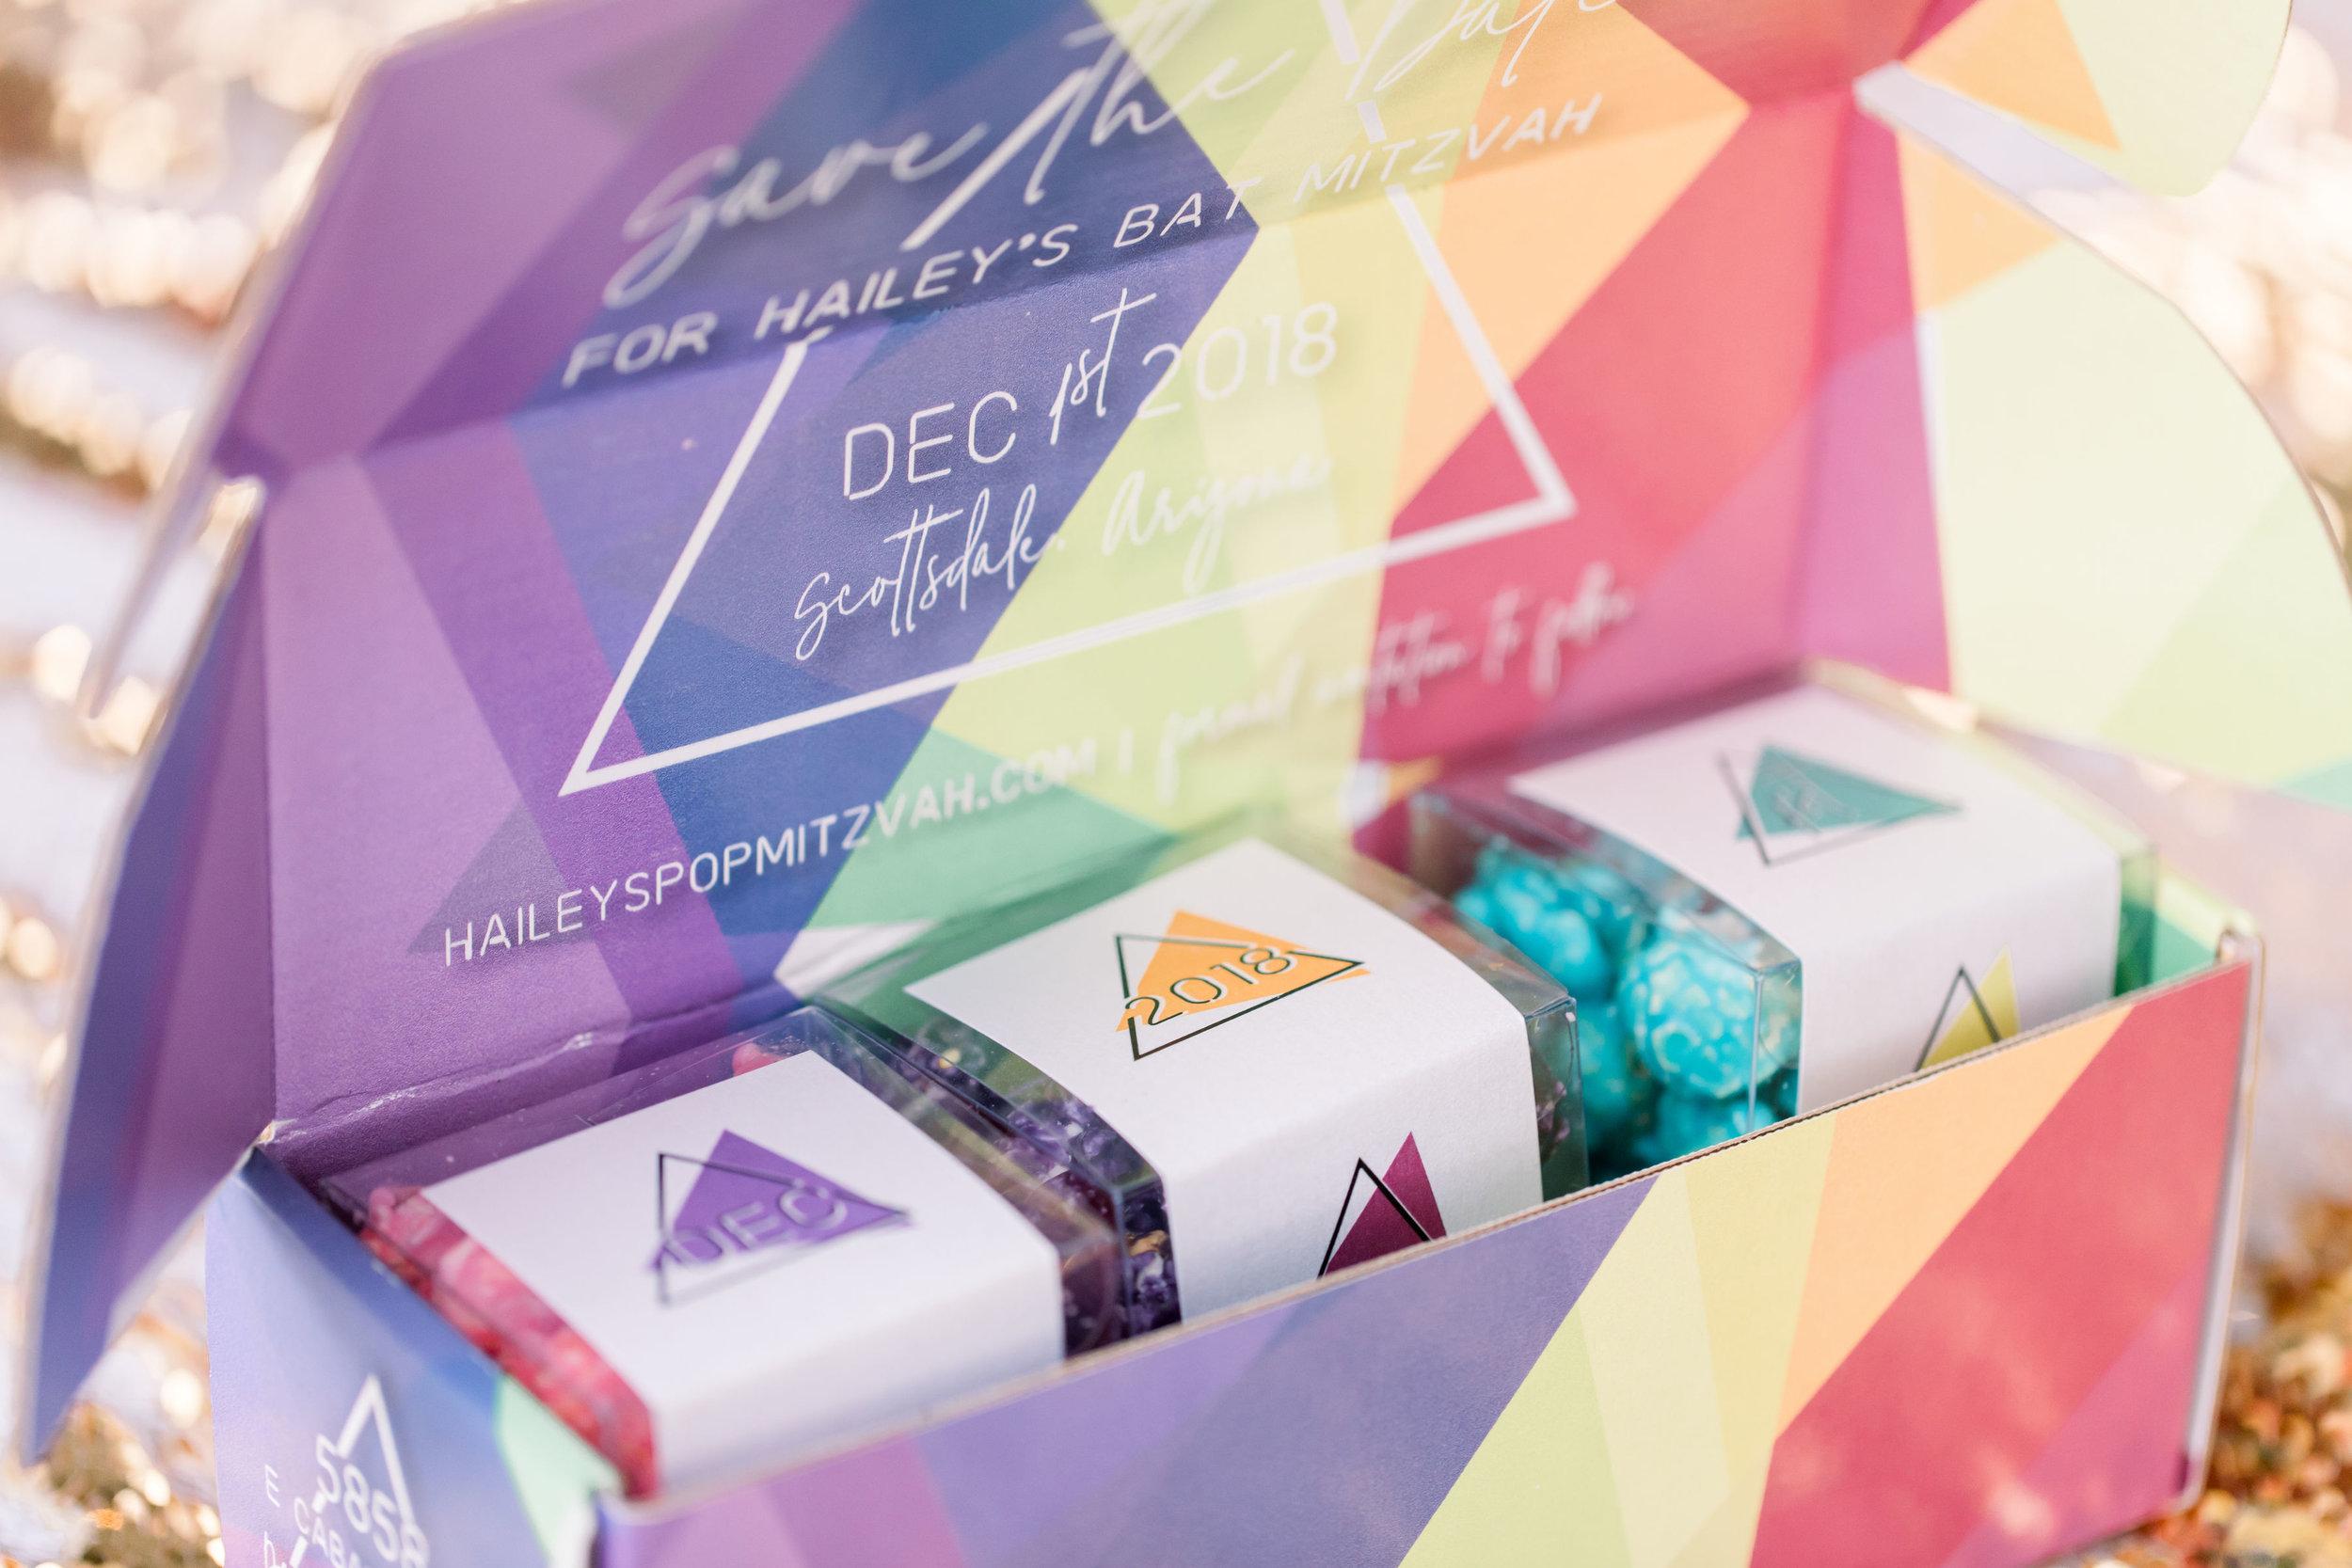 6 bat mitzvah save the date invitation custom mailing box flavored popcorn gift bat mitzvah guest surprise Life Design Events photos by Stephanie Heymann Photography.jpg